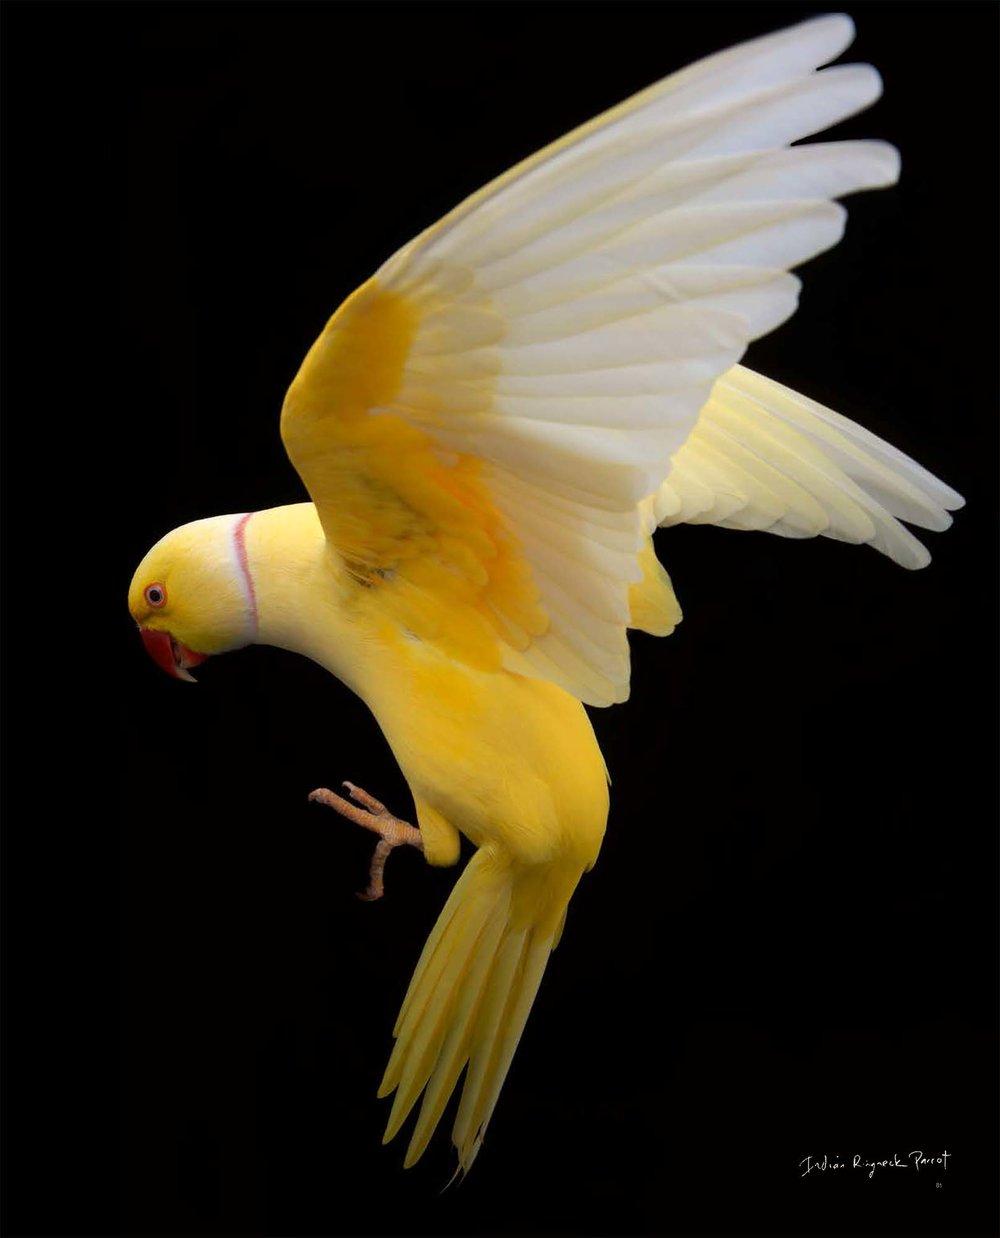 BIRD Gary Heery Book-completemmockup-83.jpg